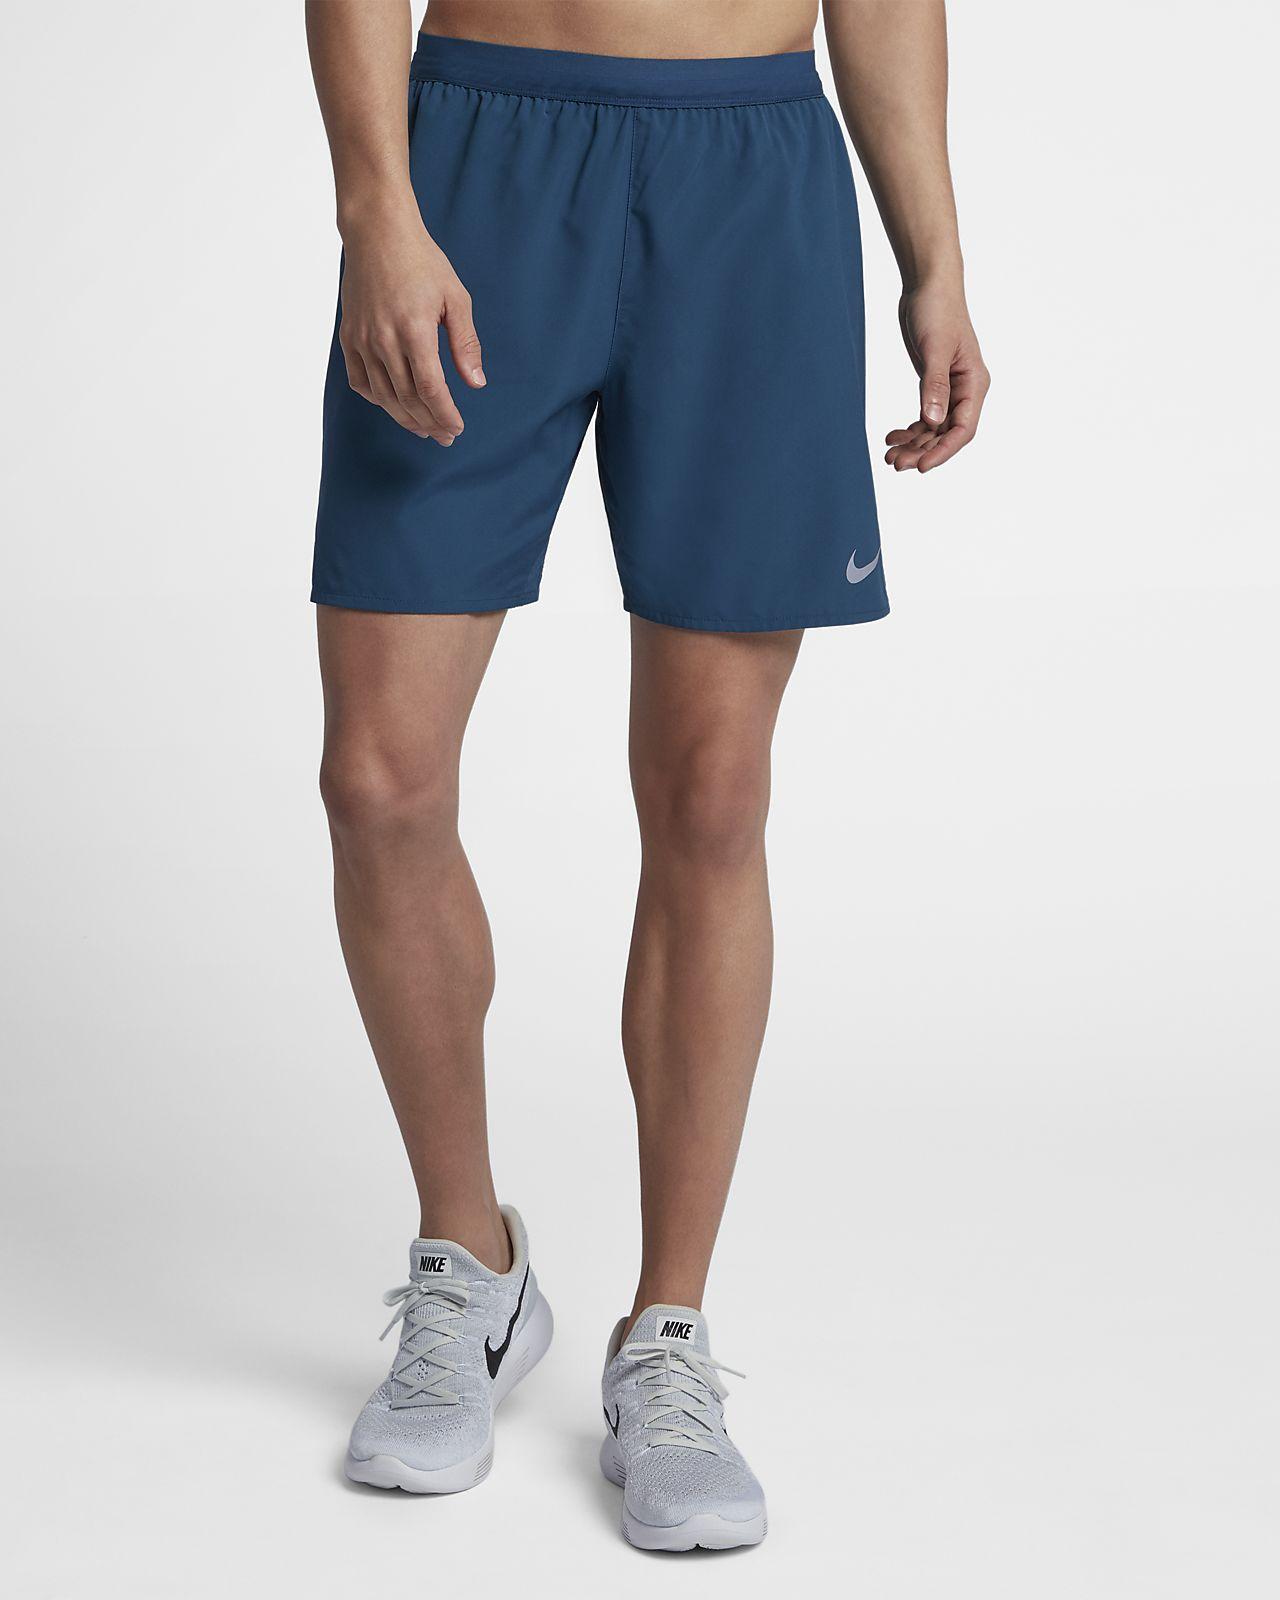 Nike running 7 distance short